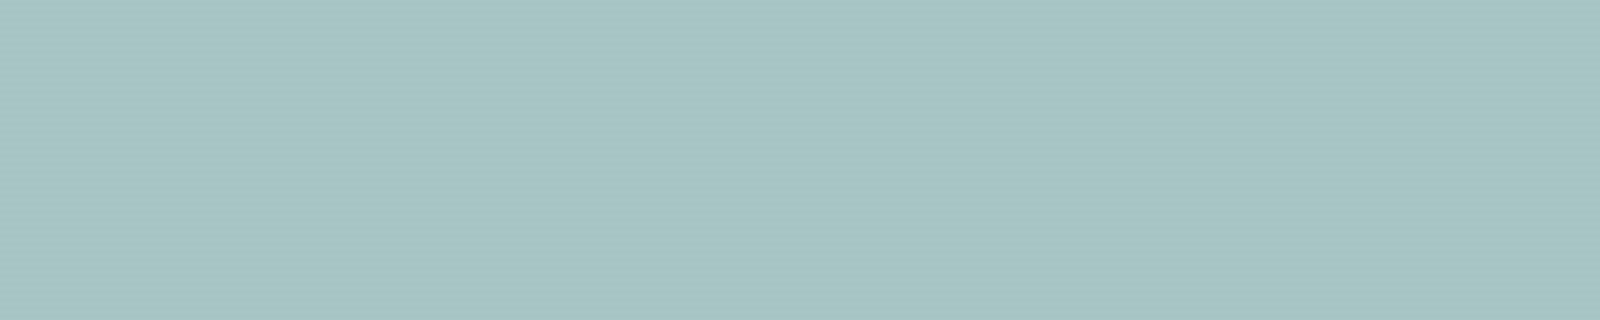 grand reserve logo blue banner image